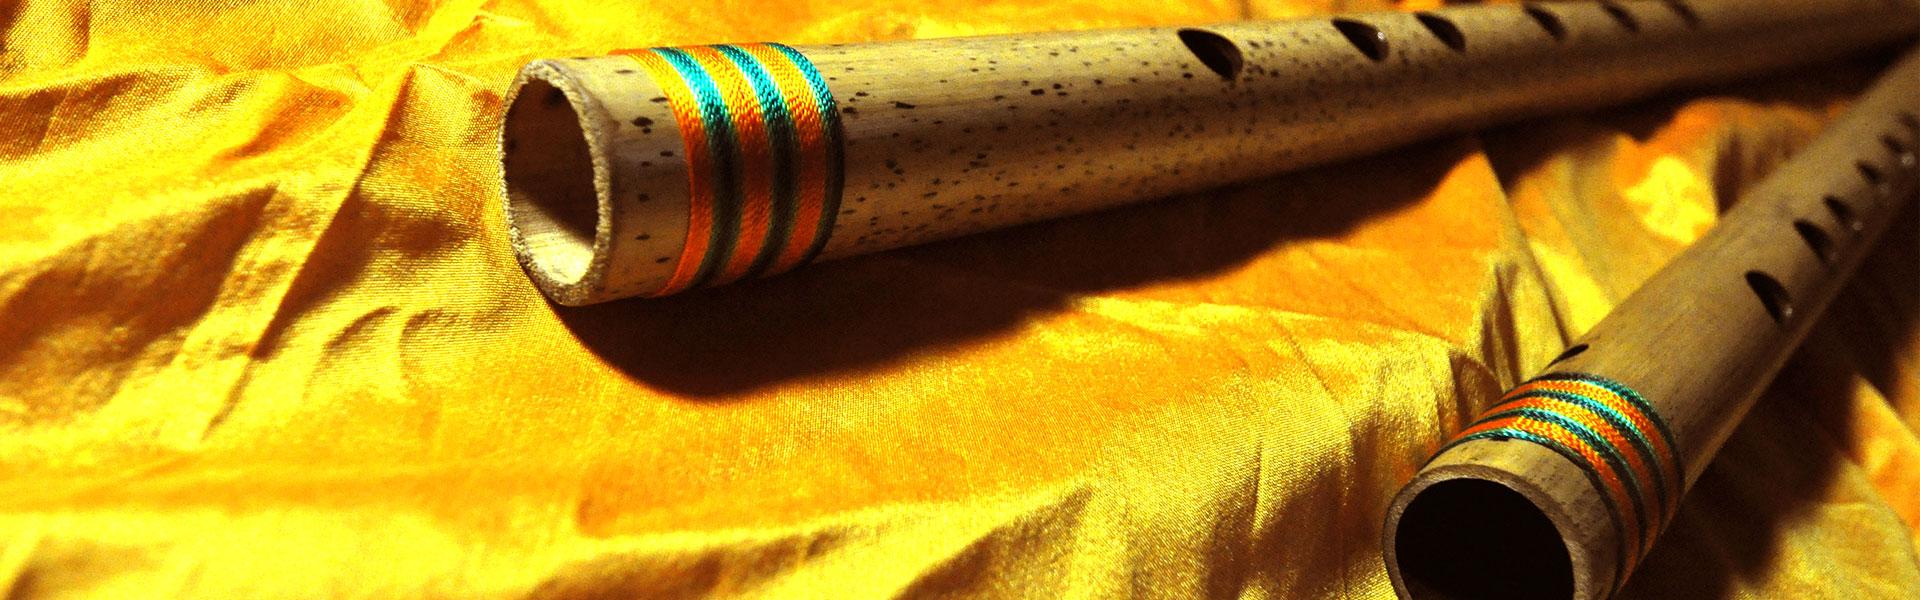 Corso di flauto indiano Bansuri - Laboratorio Armonico Akashica